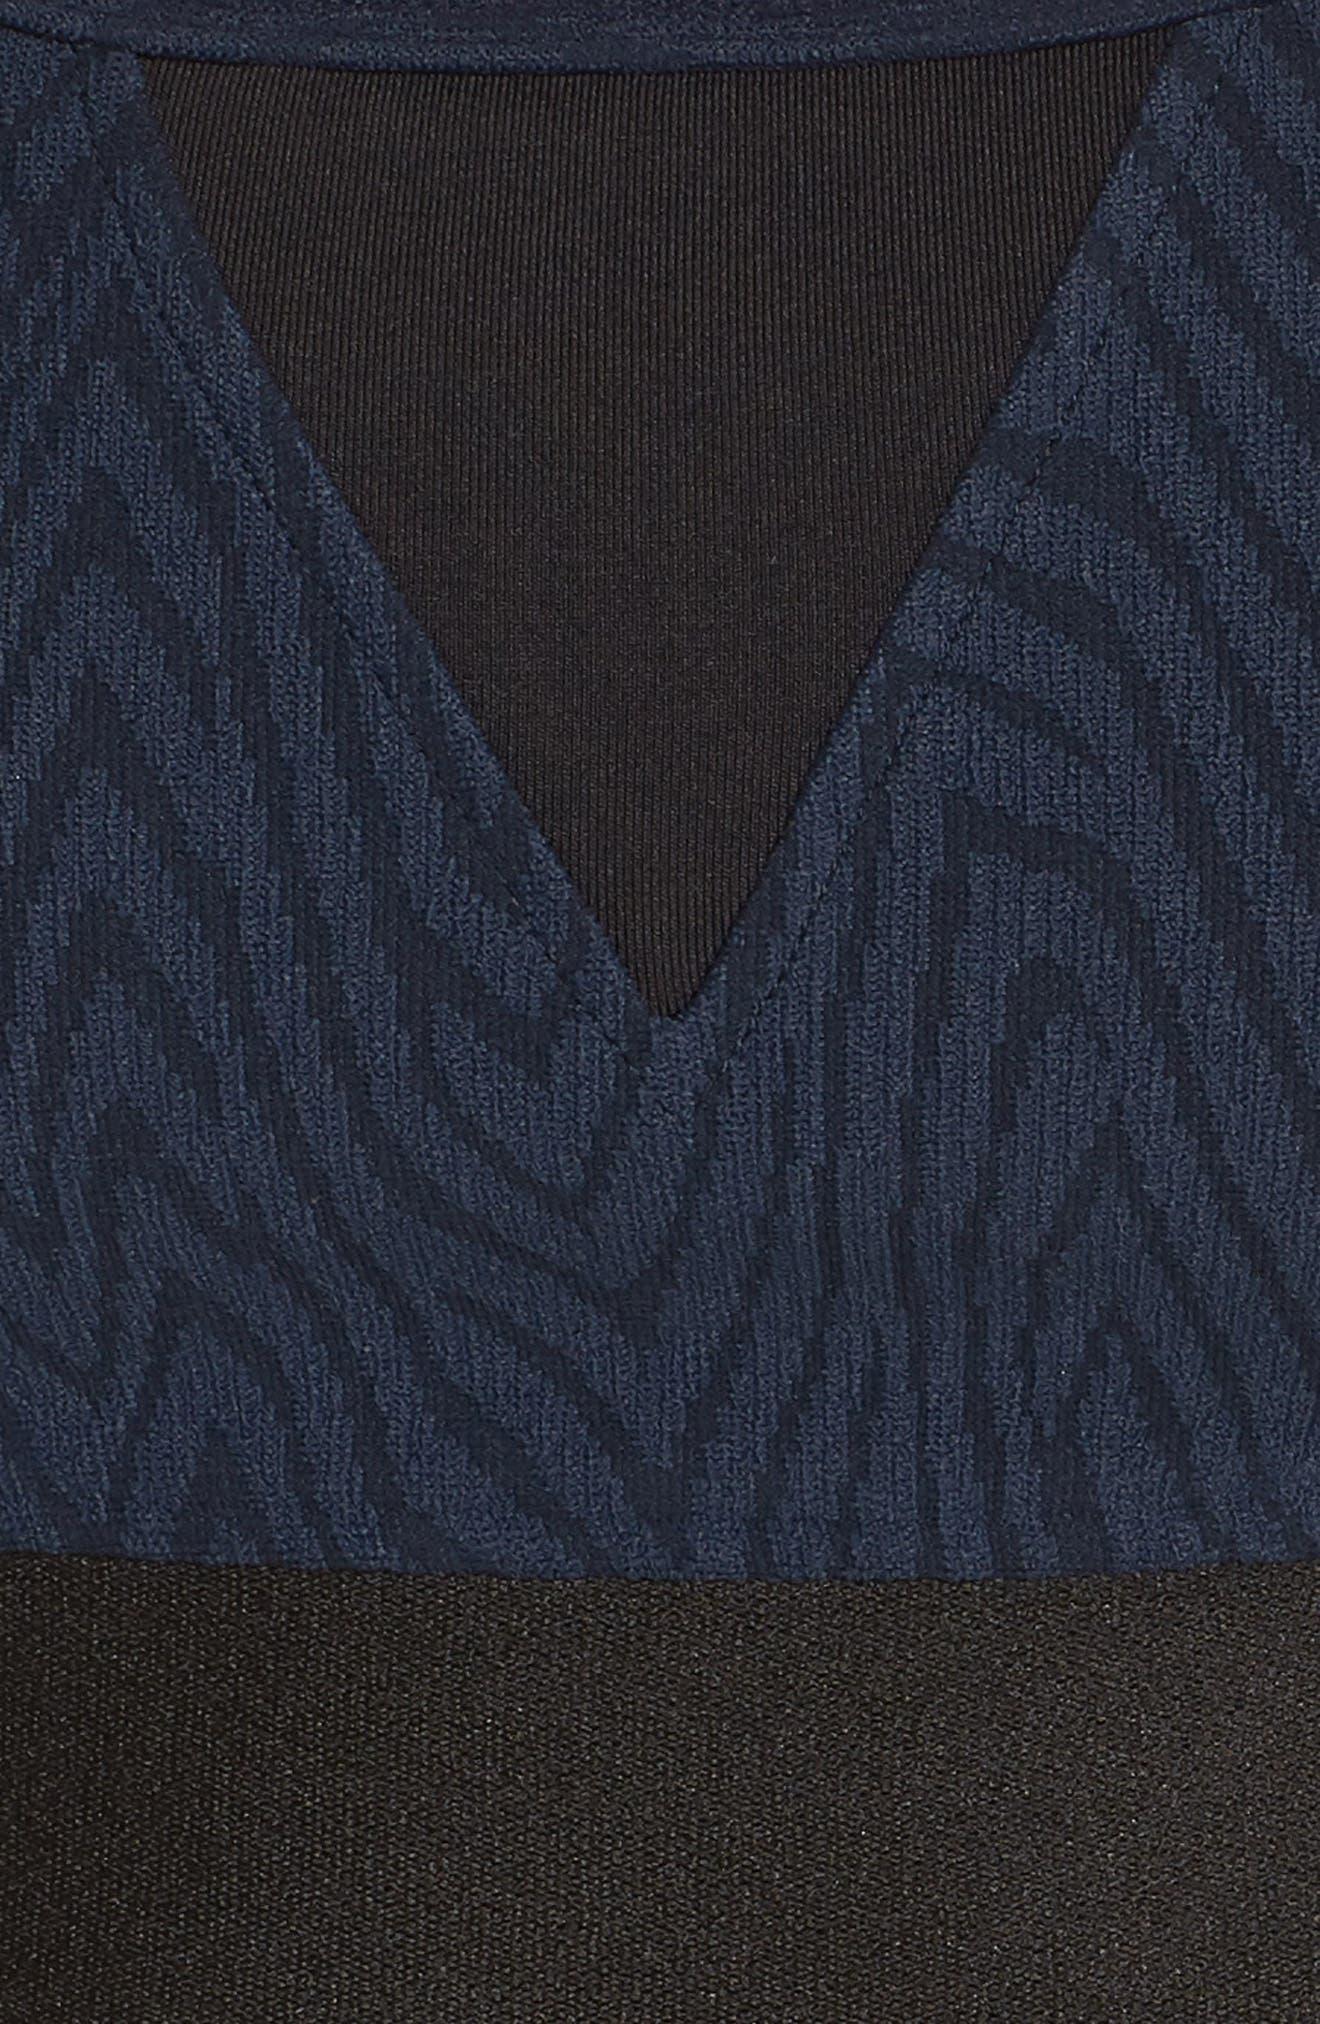 Trifecta Versatility Sports Bra,                             Alternate thumbnail 6, color,                             Midnight Blue